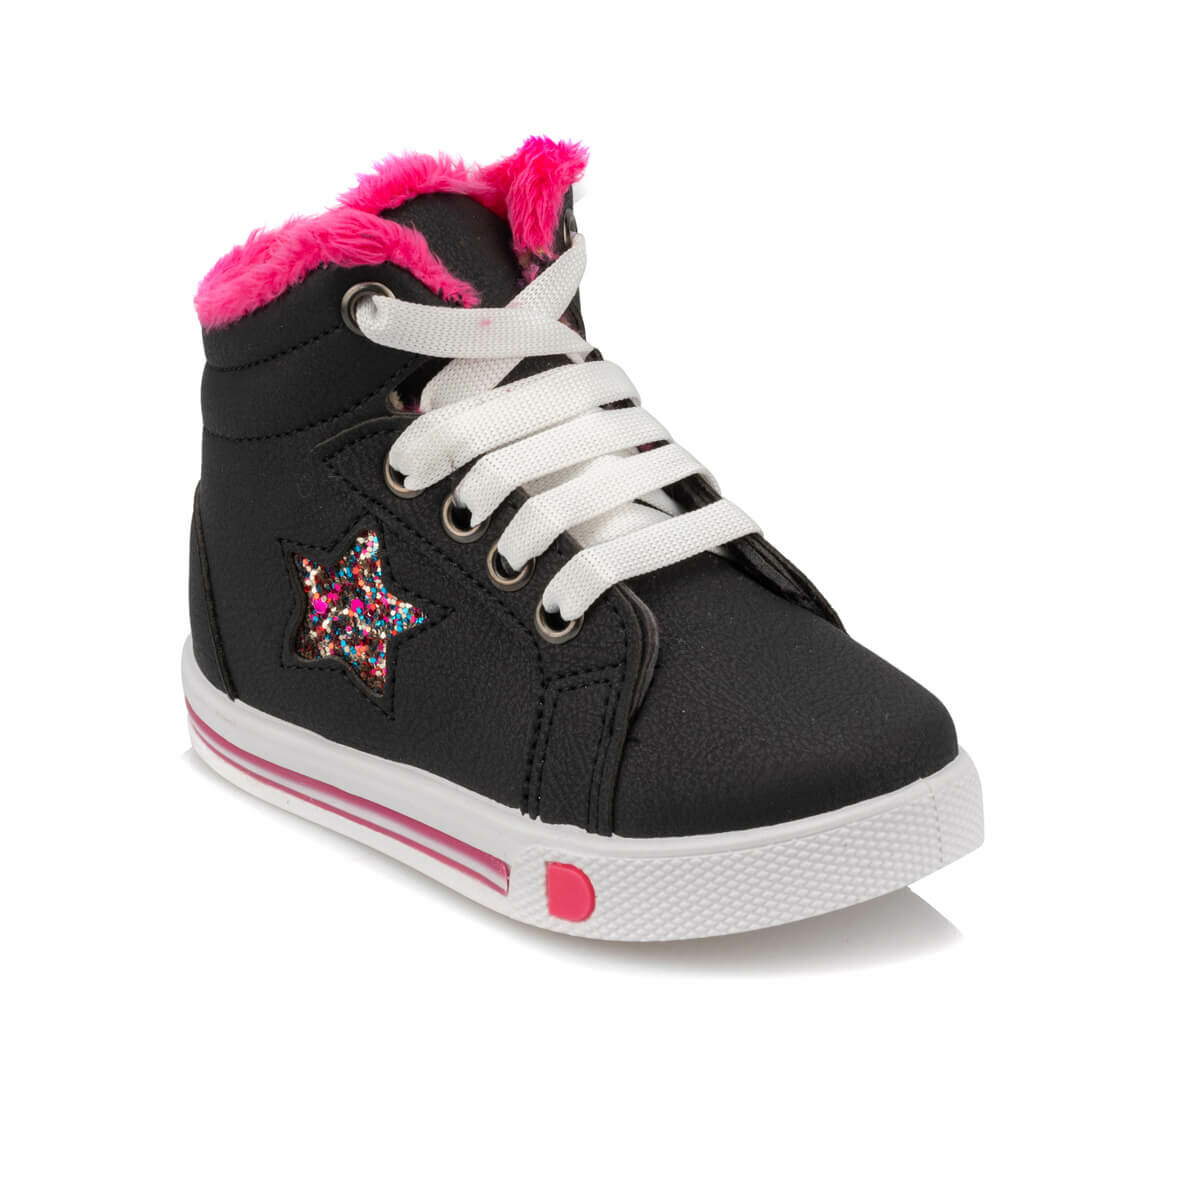 FLO 92. 510832.B Black Female Child Boots Polaris